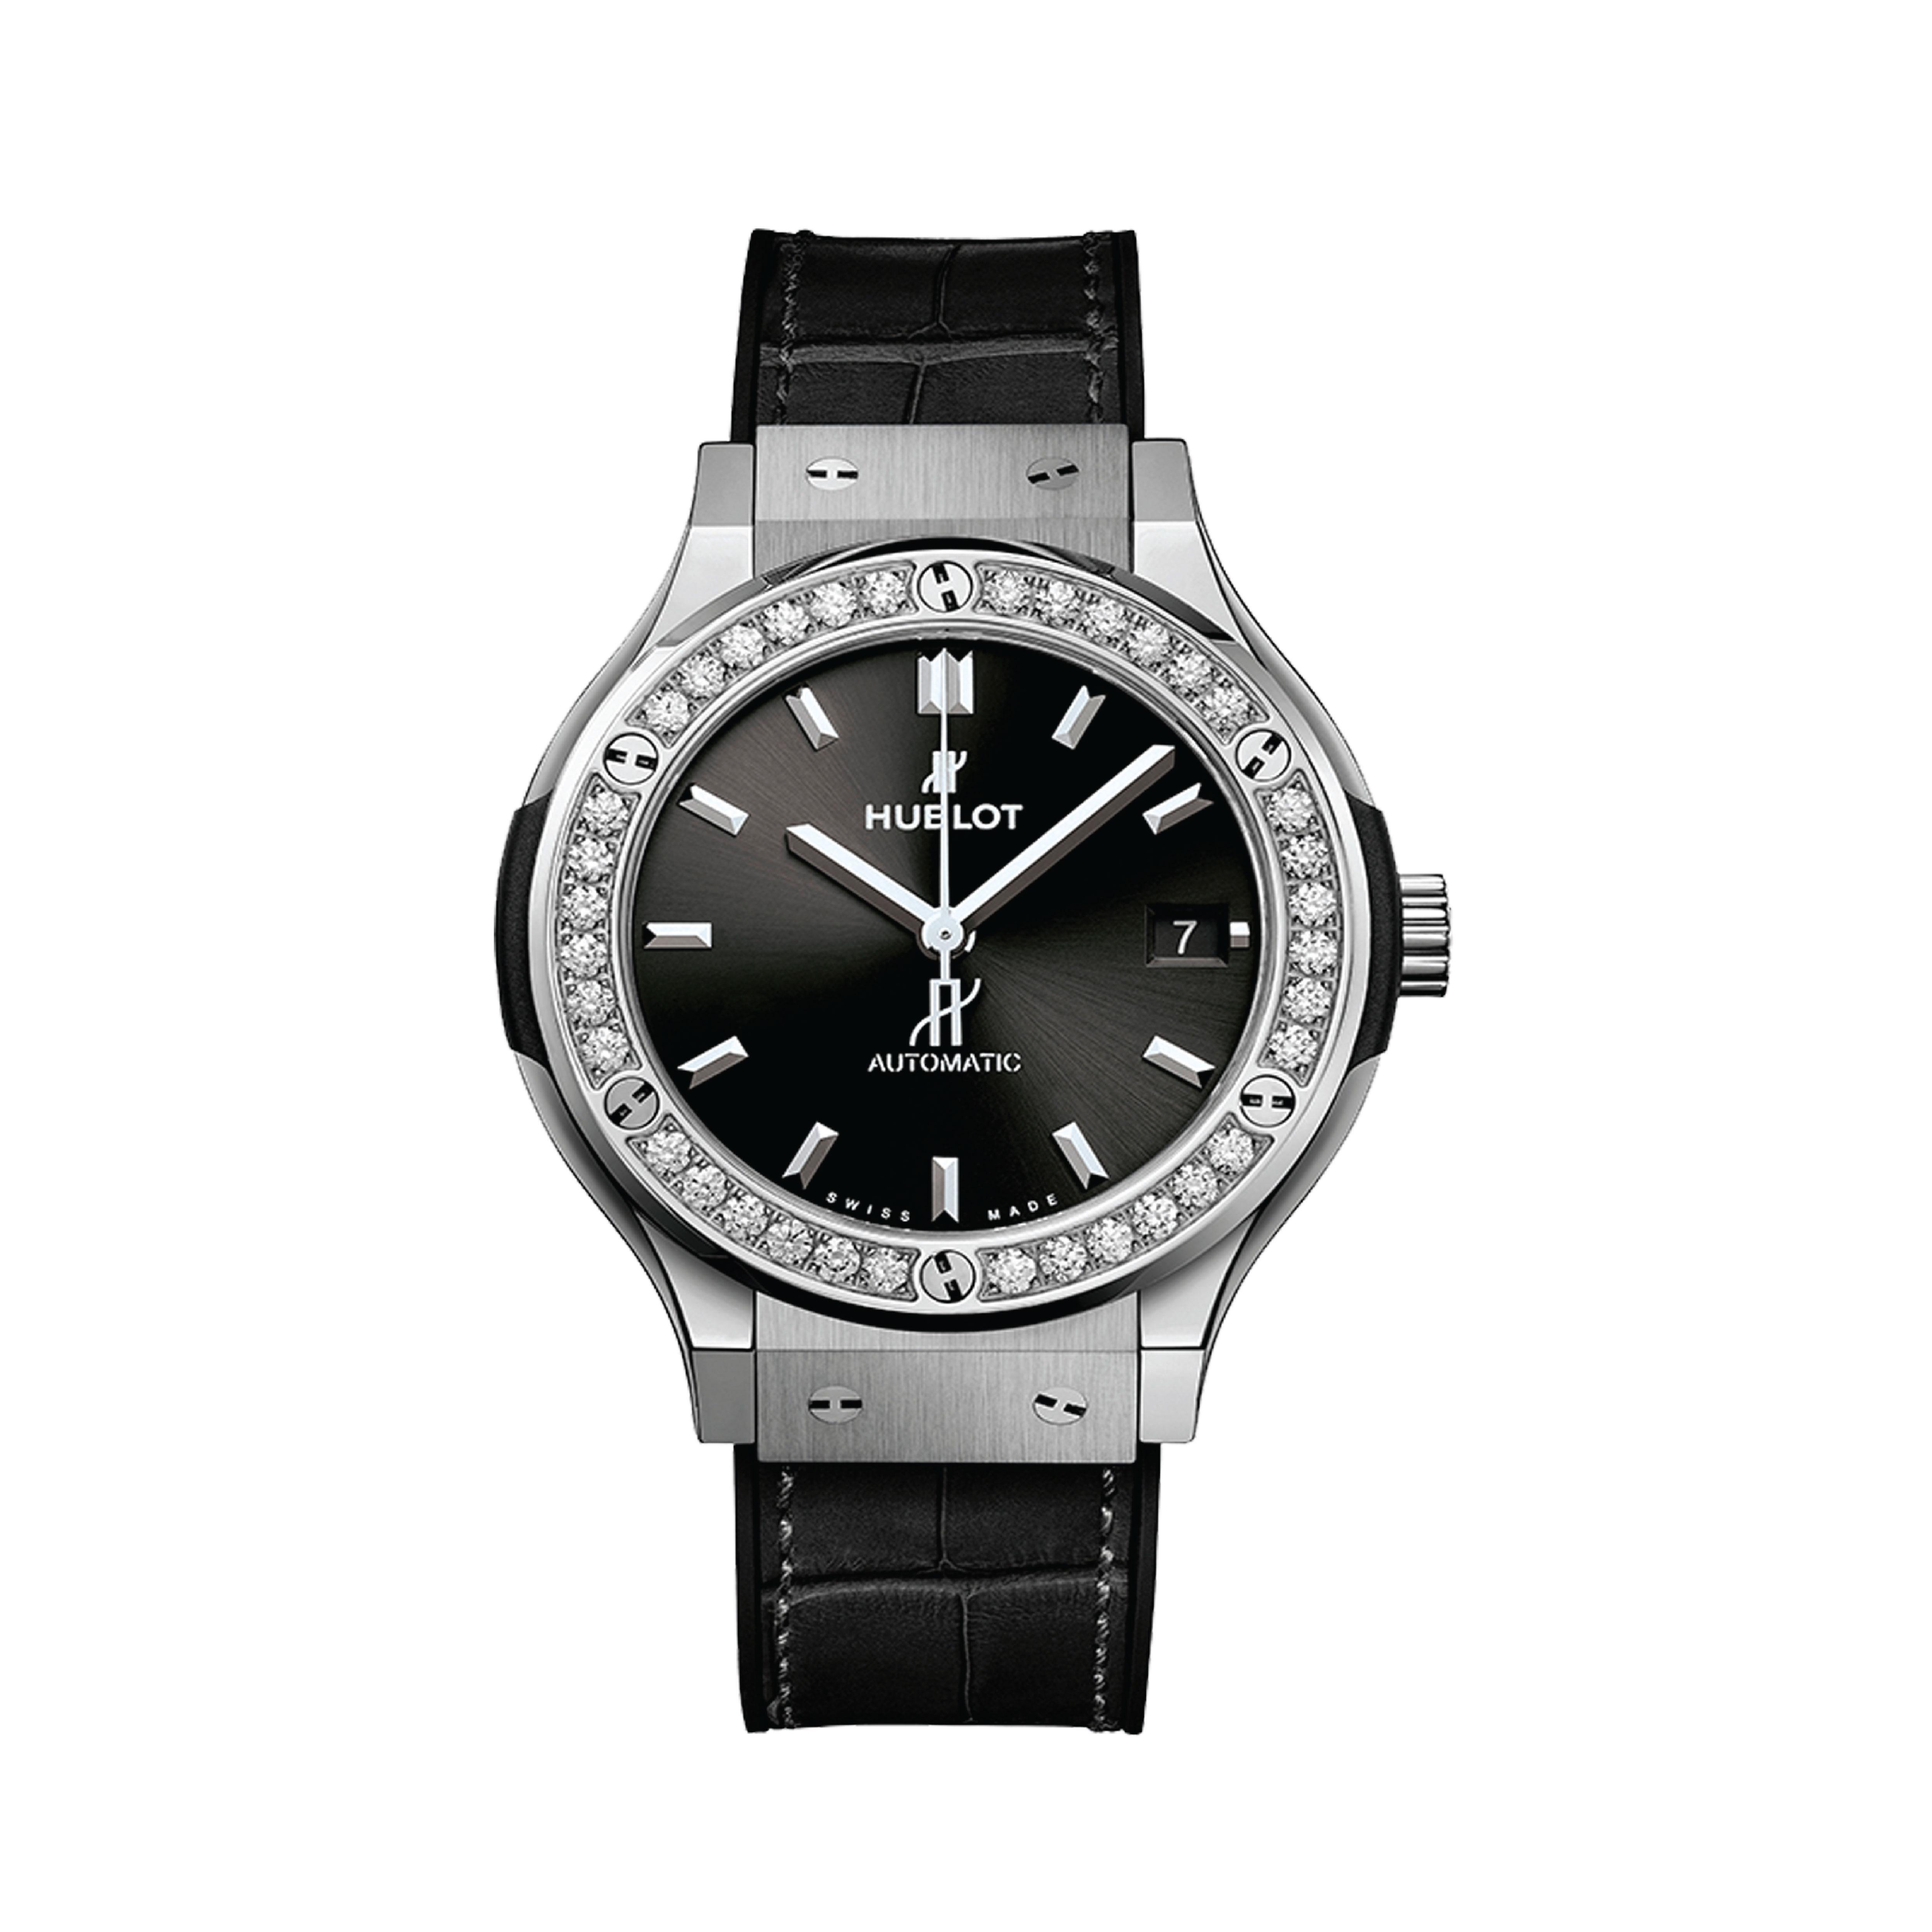 HUBLOT Часы Classic Fusion 38мм